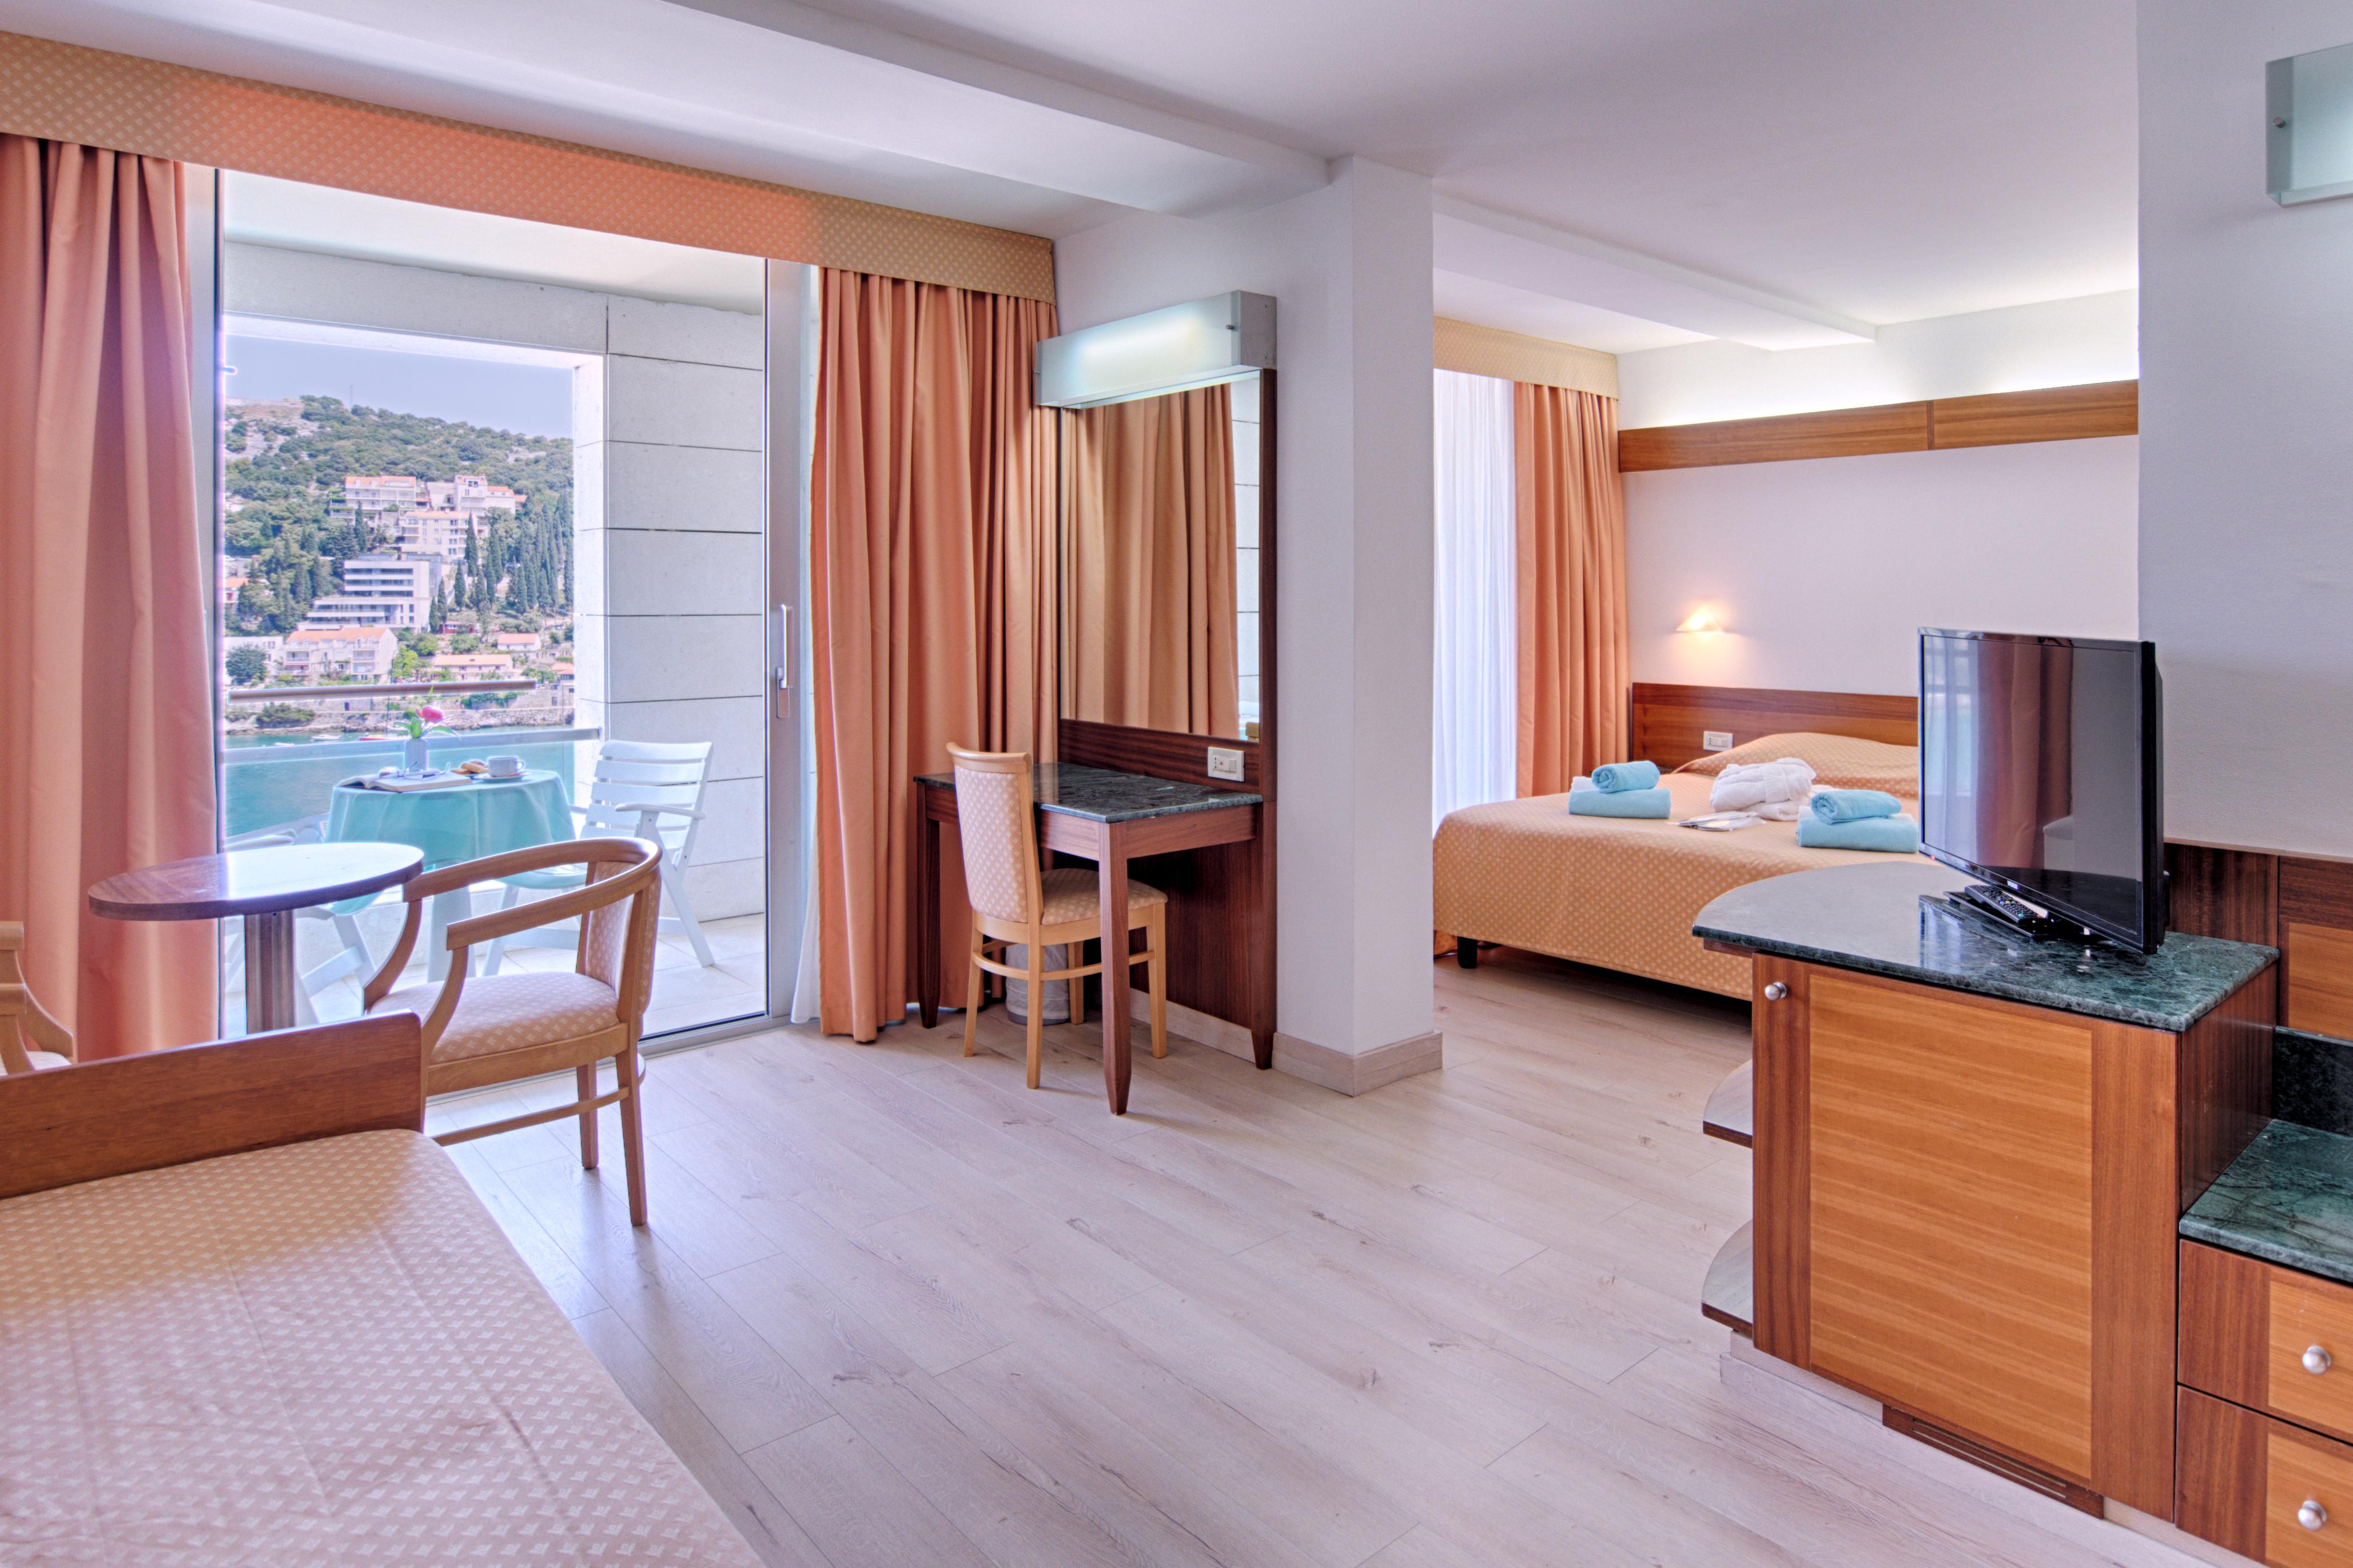 uvala-hotel-superior-room-seaview